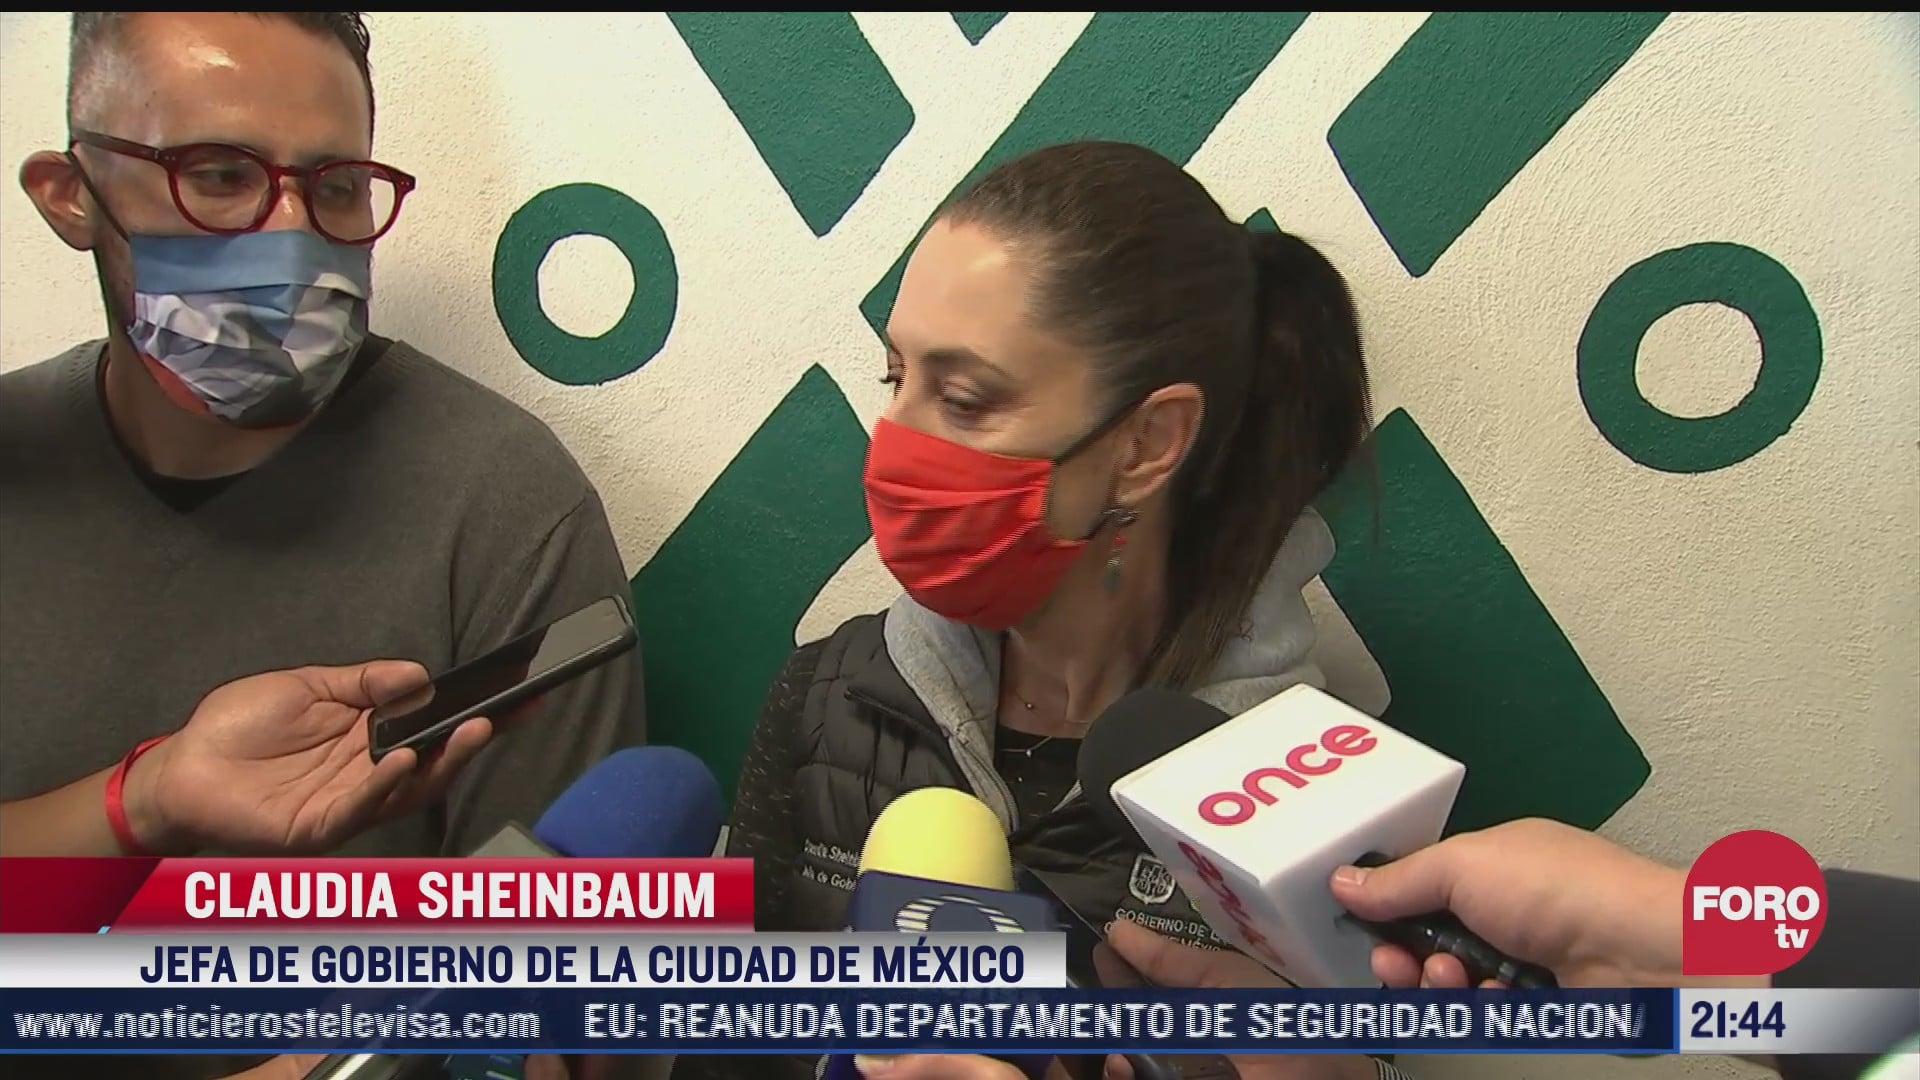 sheinbaum convoca a participar en la consulta popular